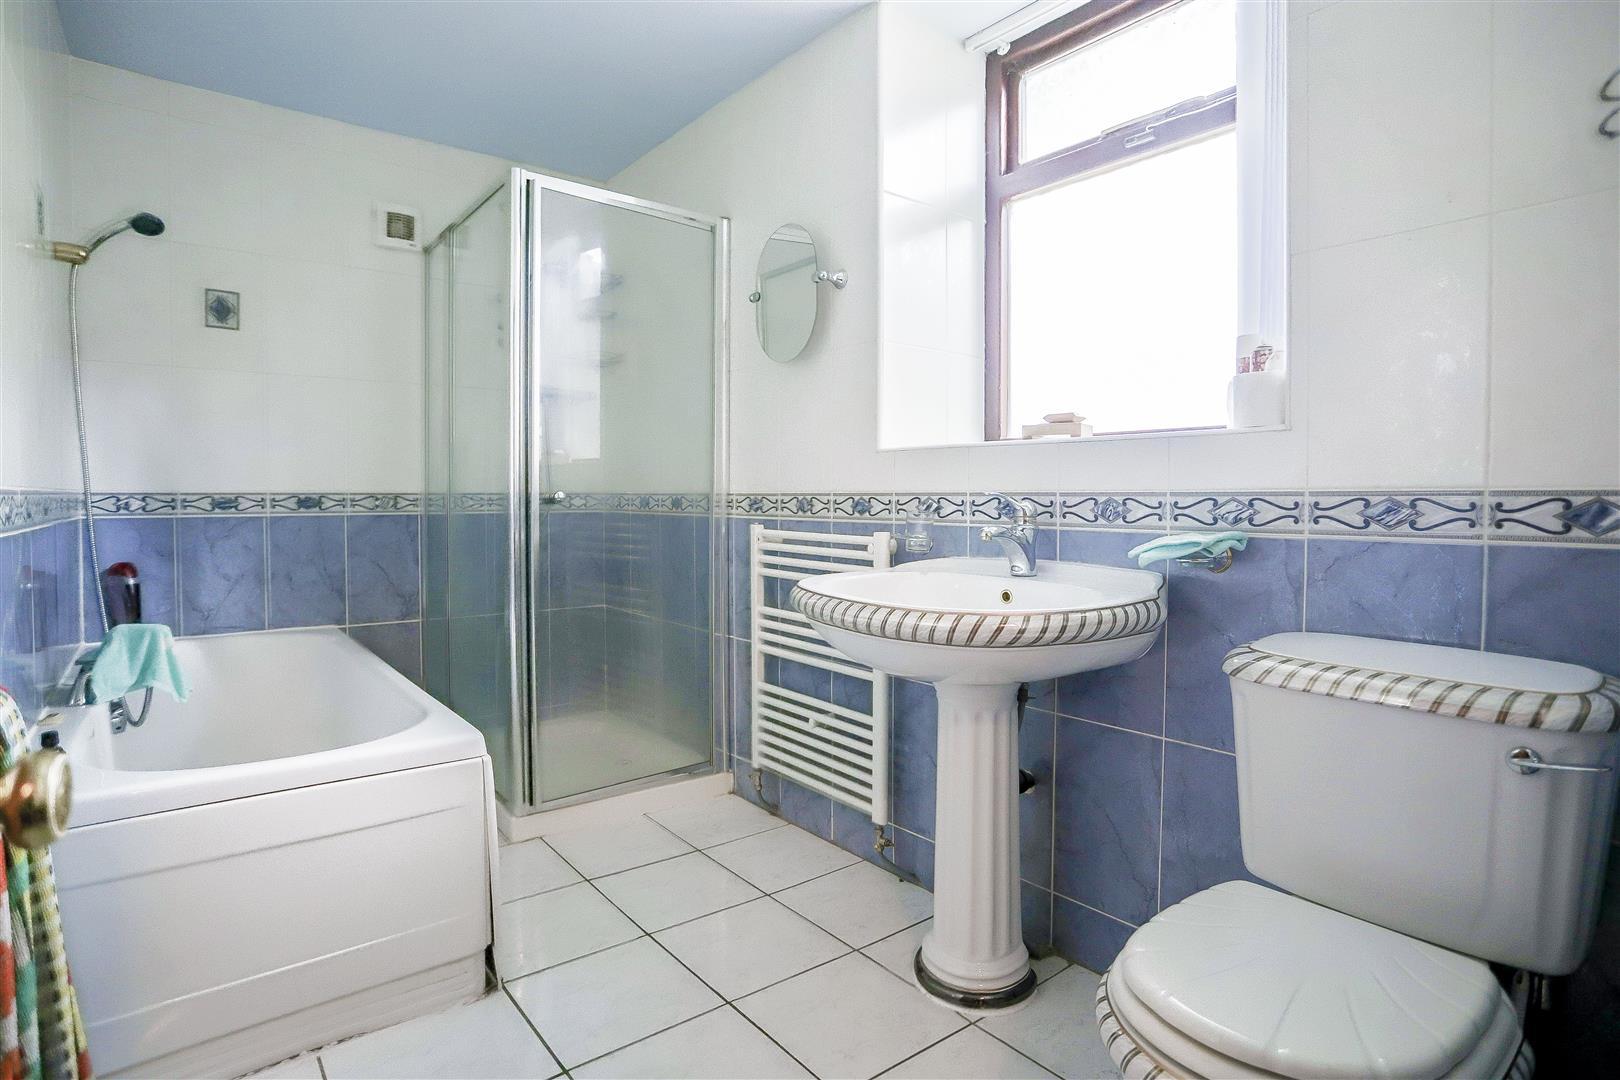 2 Bedroom Barn Conversion For Sale - 8.jpg